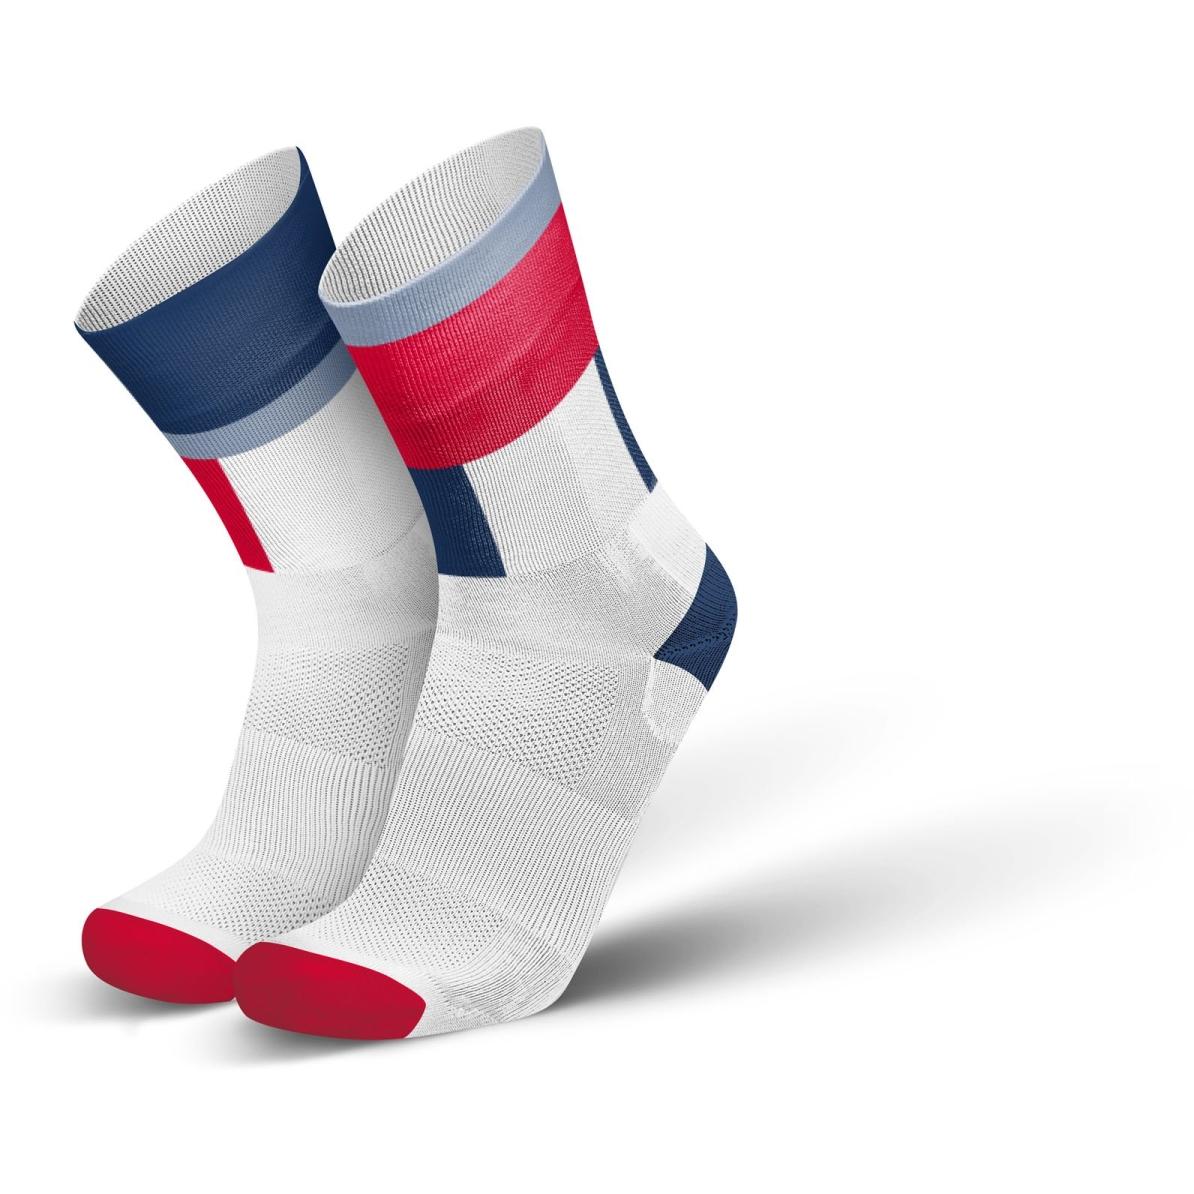 Produktbild von INCYLENCE Ultralight Zones Socken - Navy Red